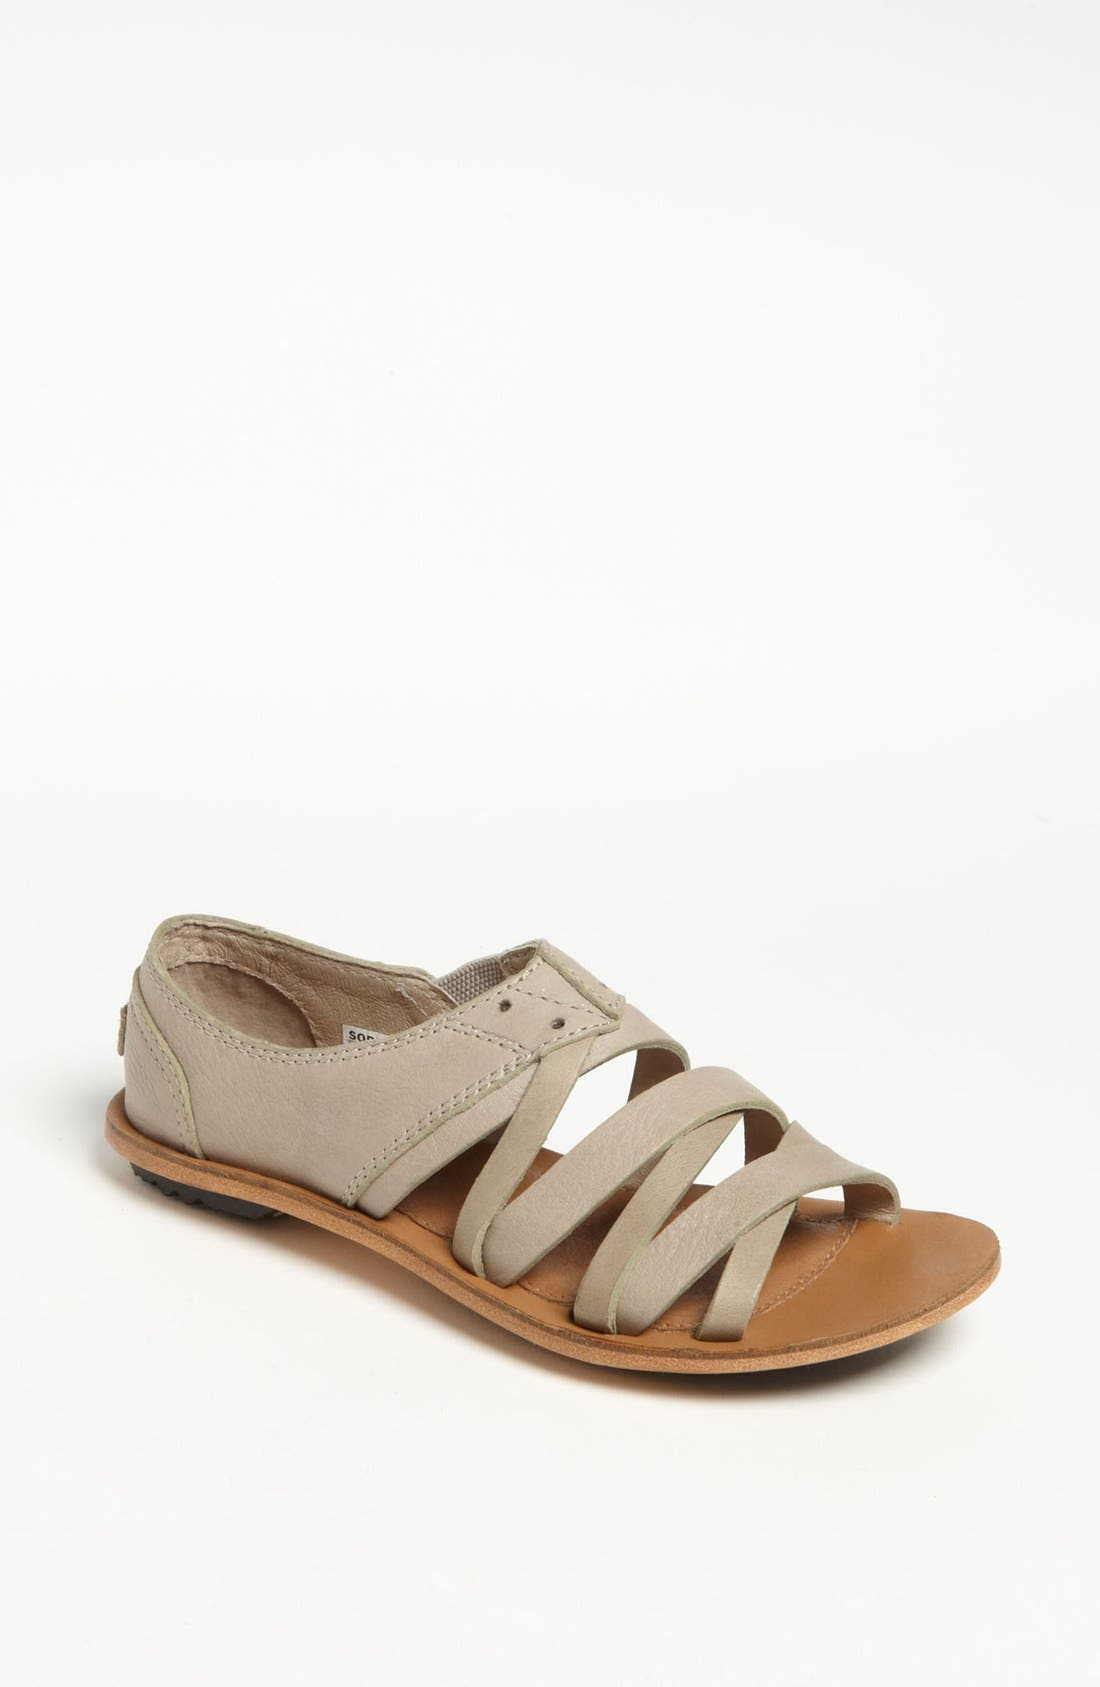 Alternate Image 1 Selected - Sorel 'Lake' Shoe Sandal